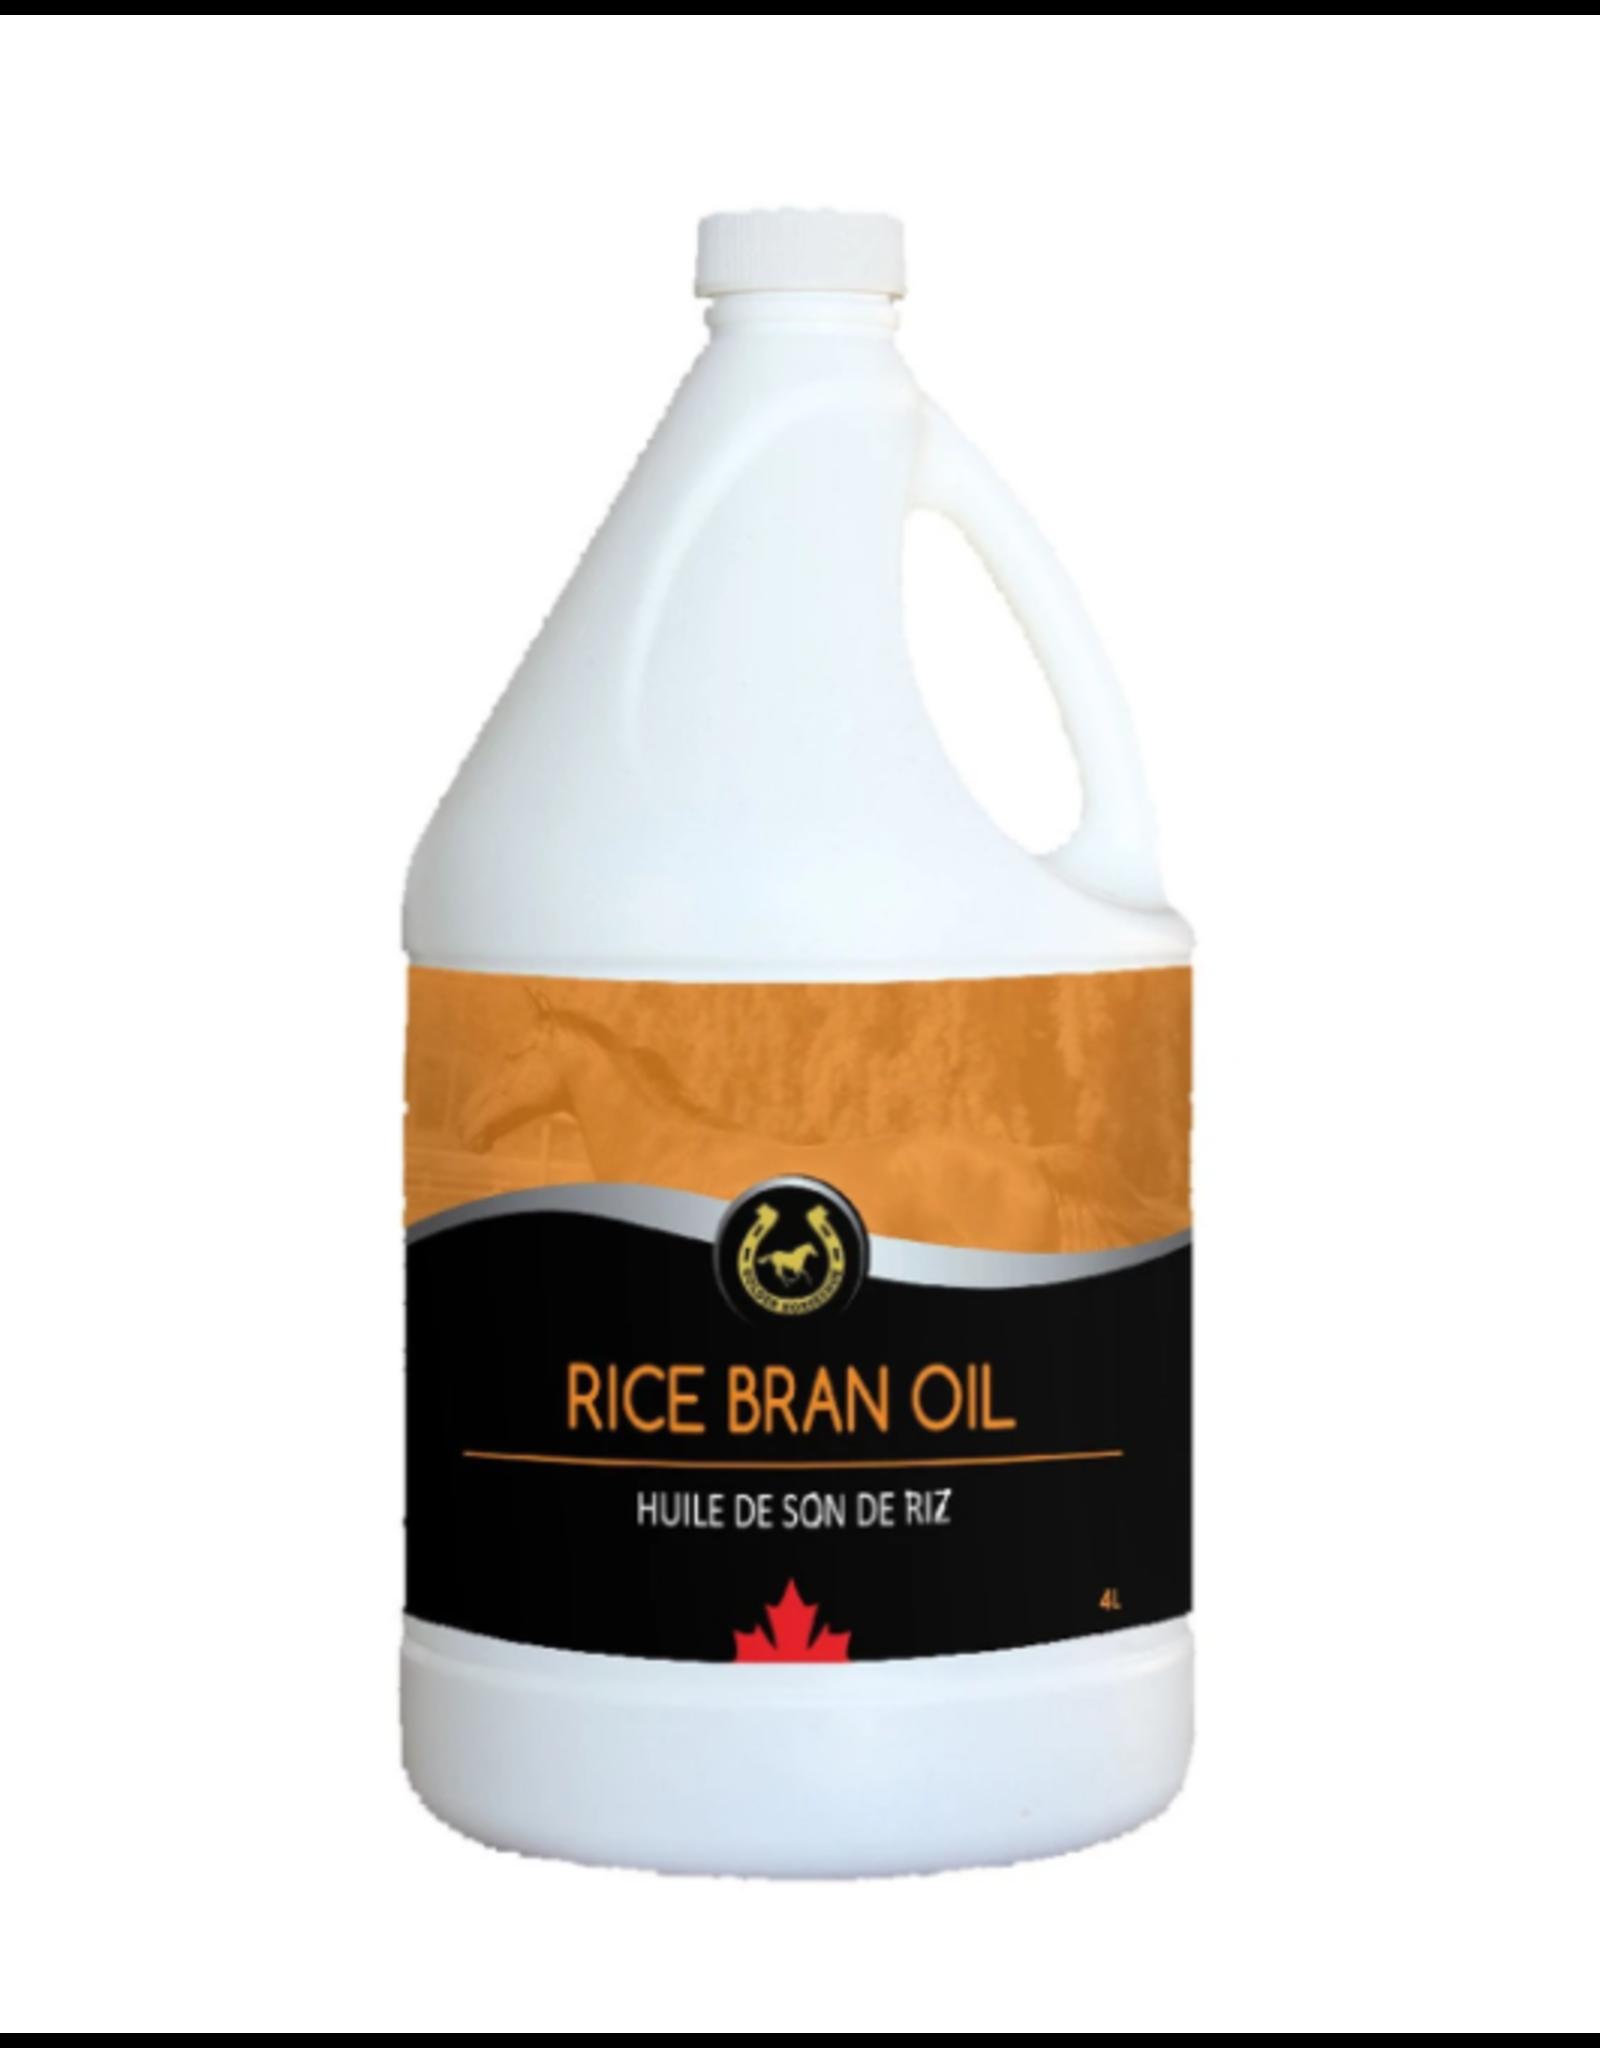 GHS GHS Rice Bran Oil 4L